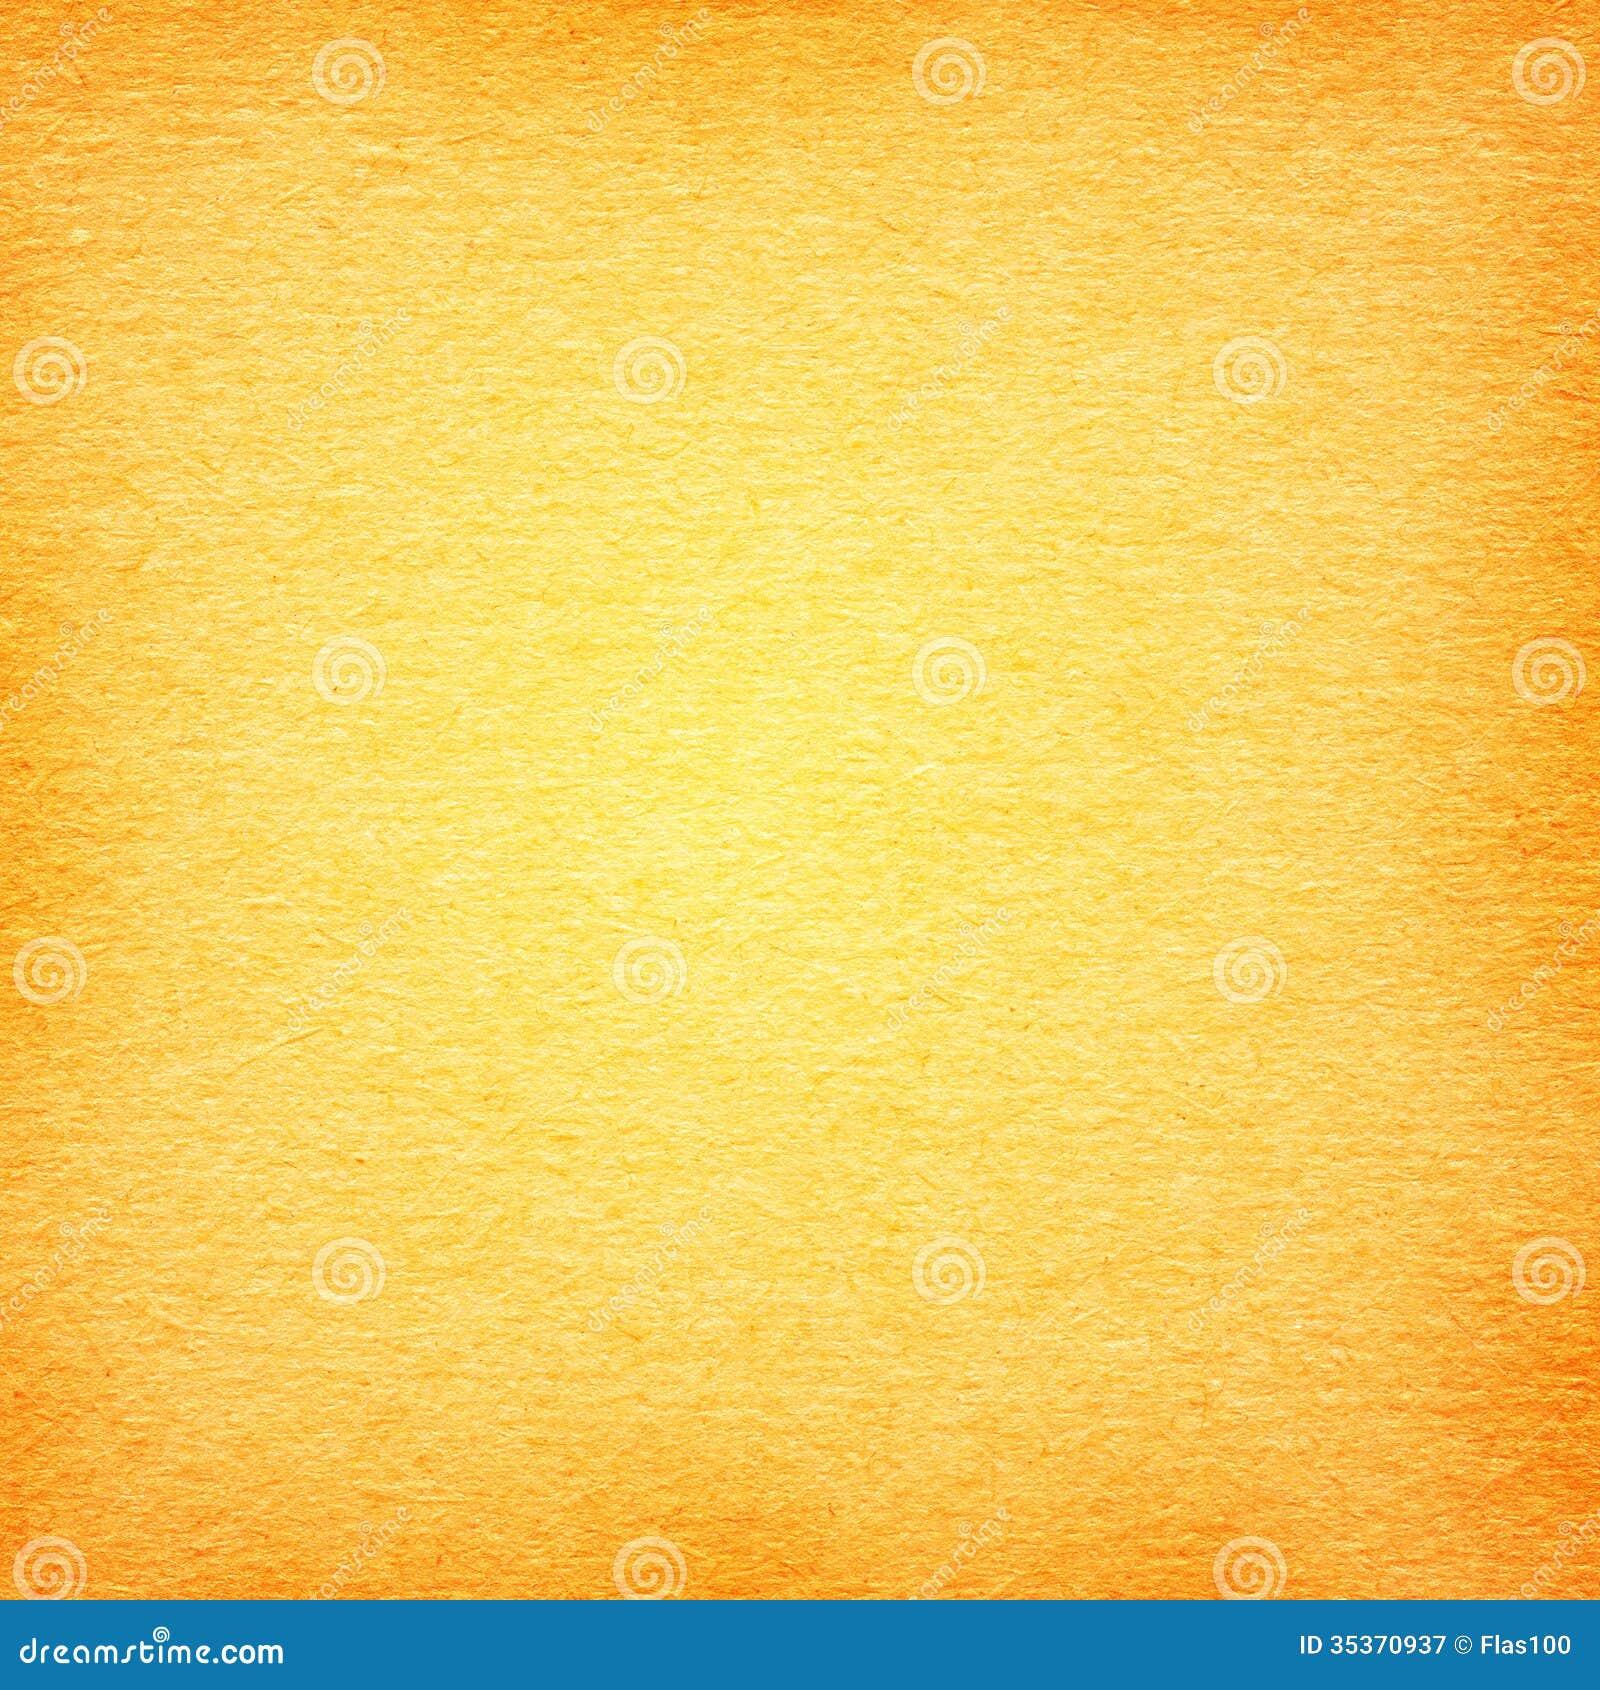 light orange background texture gallery